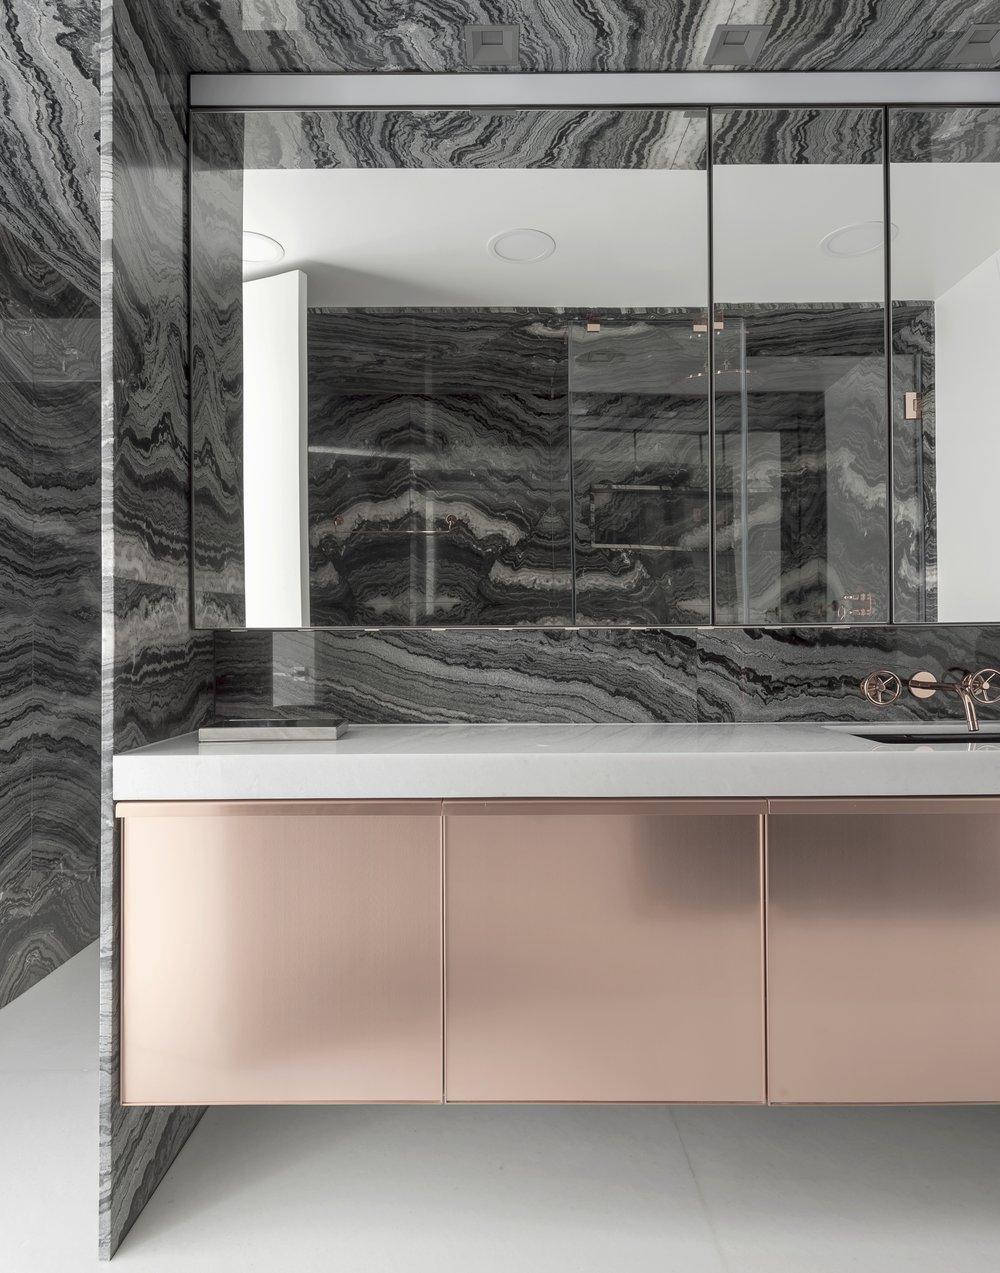 East 77th Apartment Bathroom Sink and Vanity